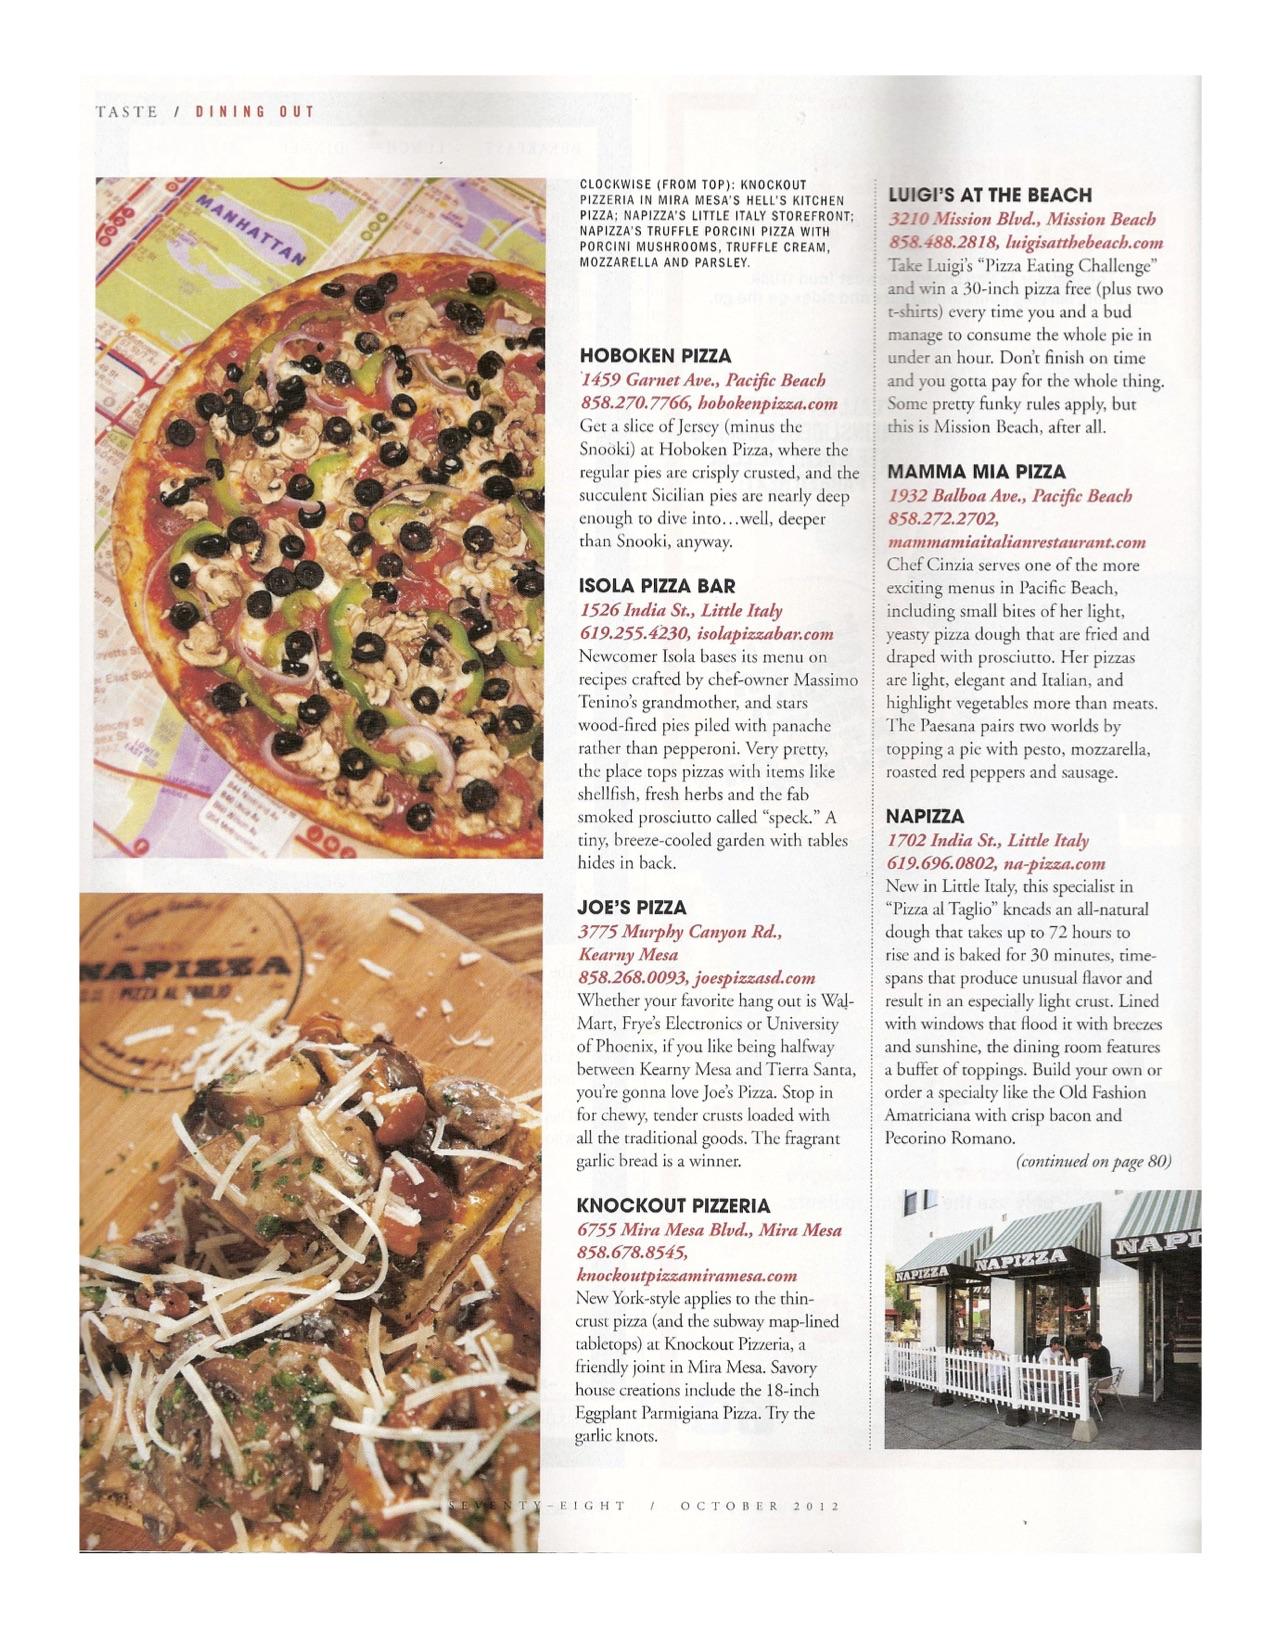 3-Isola Pizza Bar_PACIFIC Magazine_October 2012.jpg